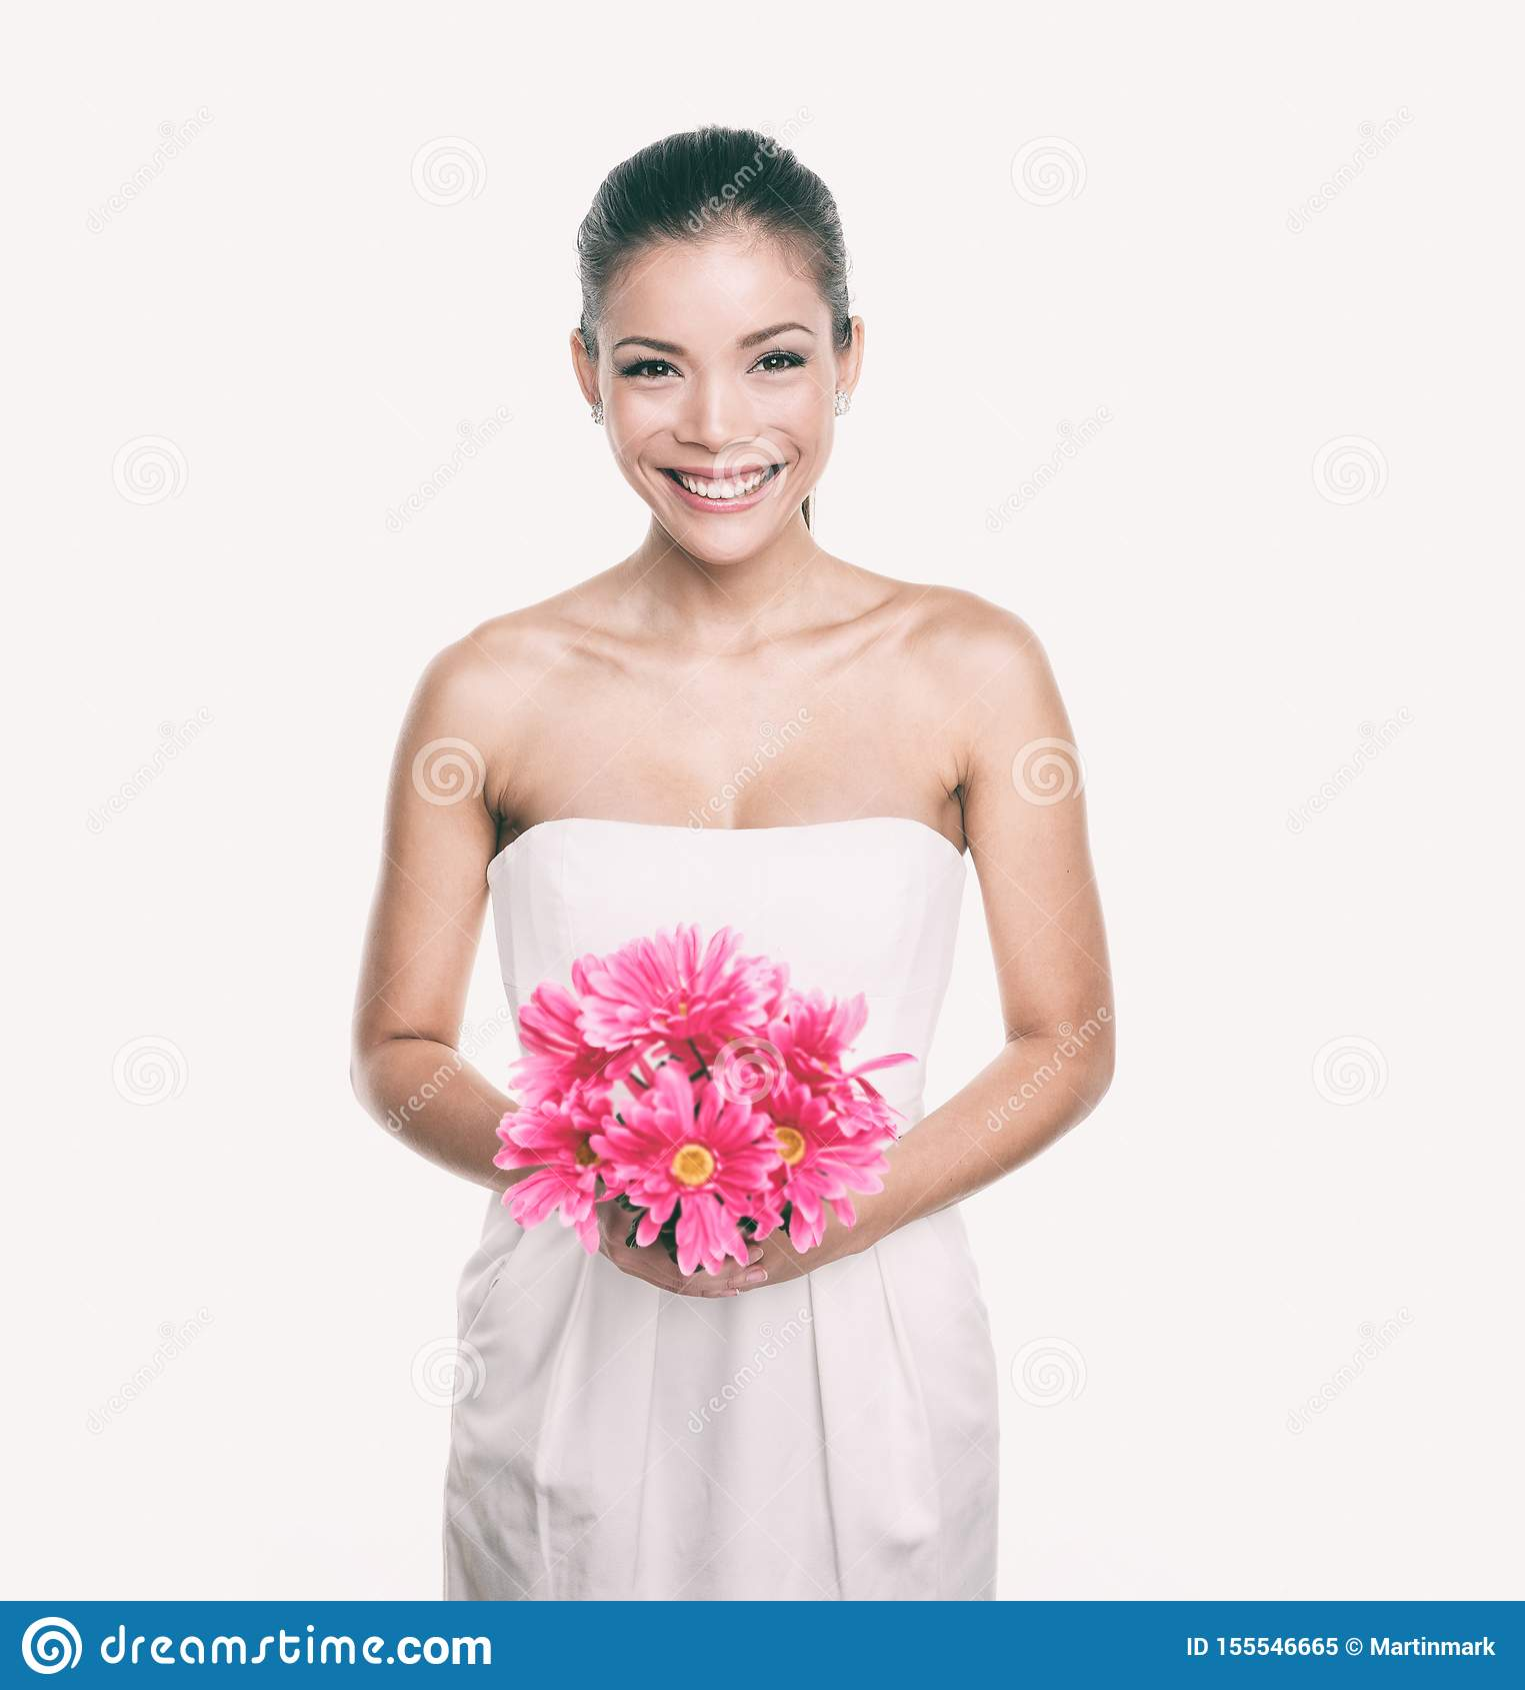 Bridesmaid Wedding Dress Girl With Flower Bouquet Asian Woman